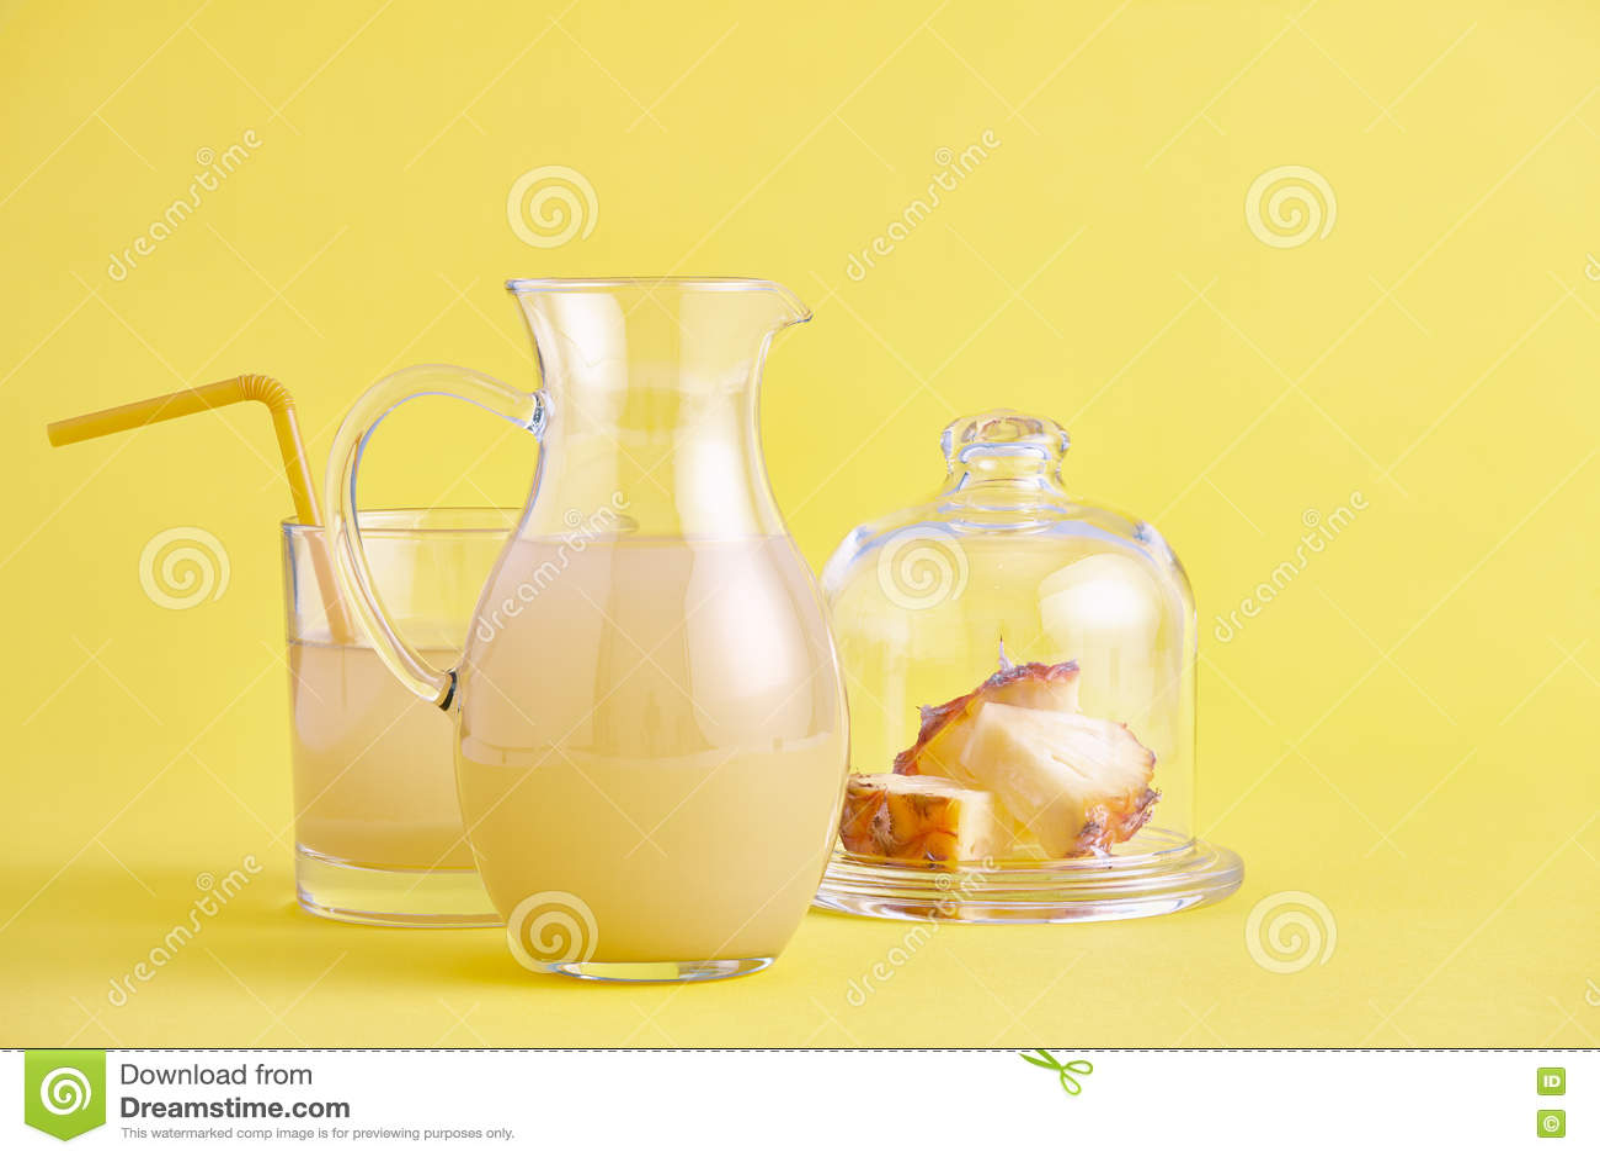 Jarro de vidro de suco de abacaxi fresco no amarelo